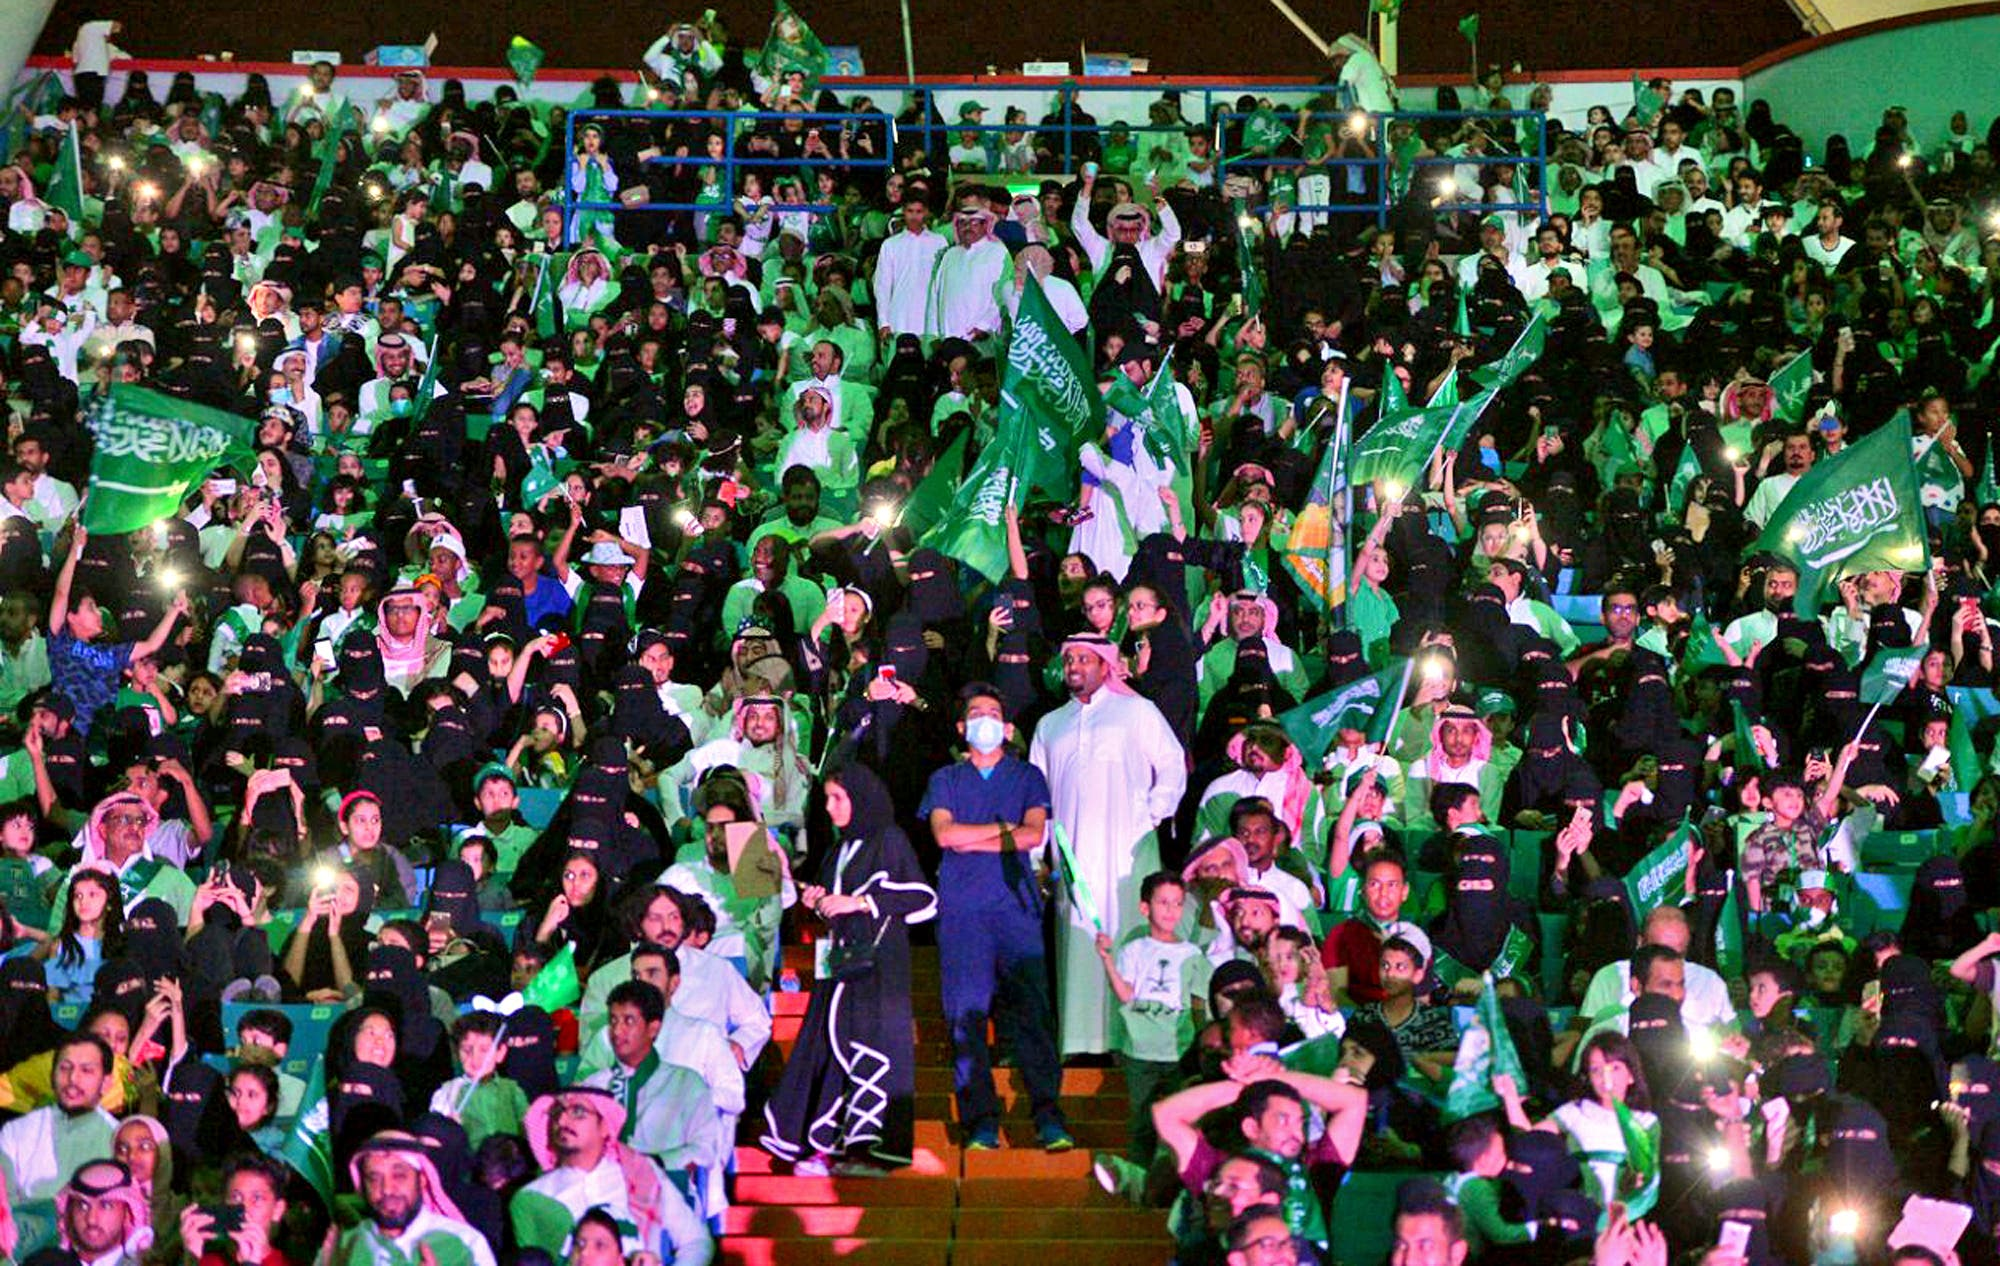 Saudi men and women attend the national day ceremonies at the King Fahd stadium in Riyadh on September 23, 2017. (Saudi Press Agency via AP)